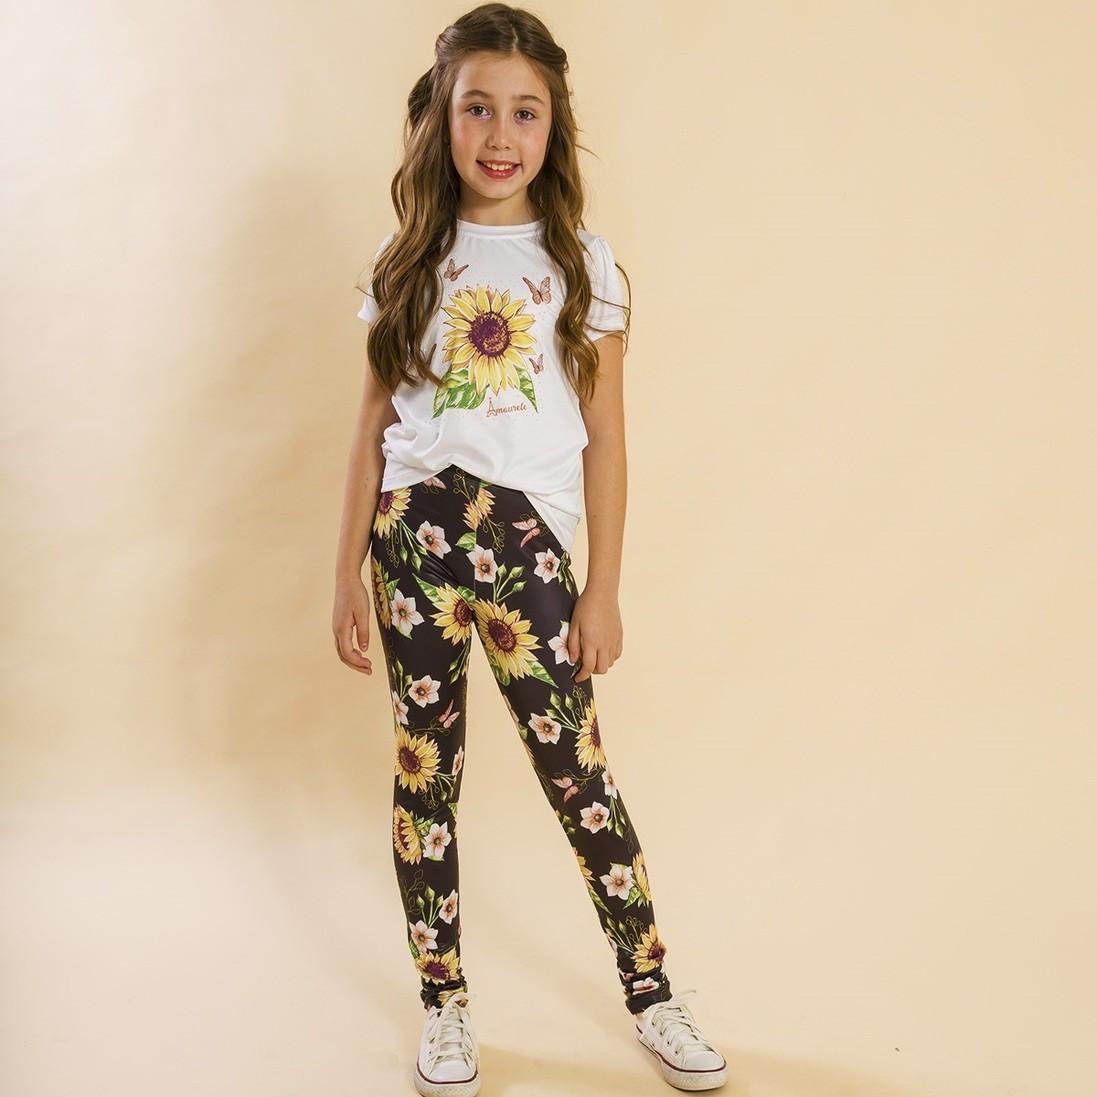 BAZAR - Conjunto Infantil Blusa e Legging Comprida Girassol